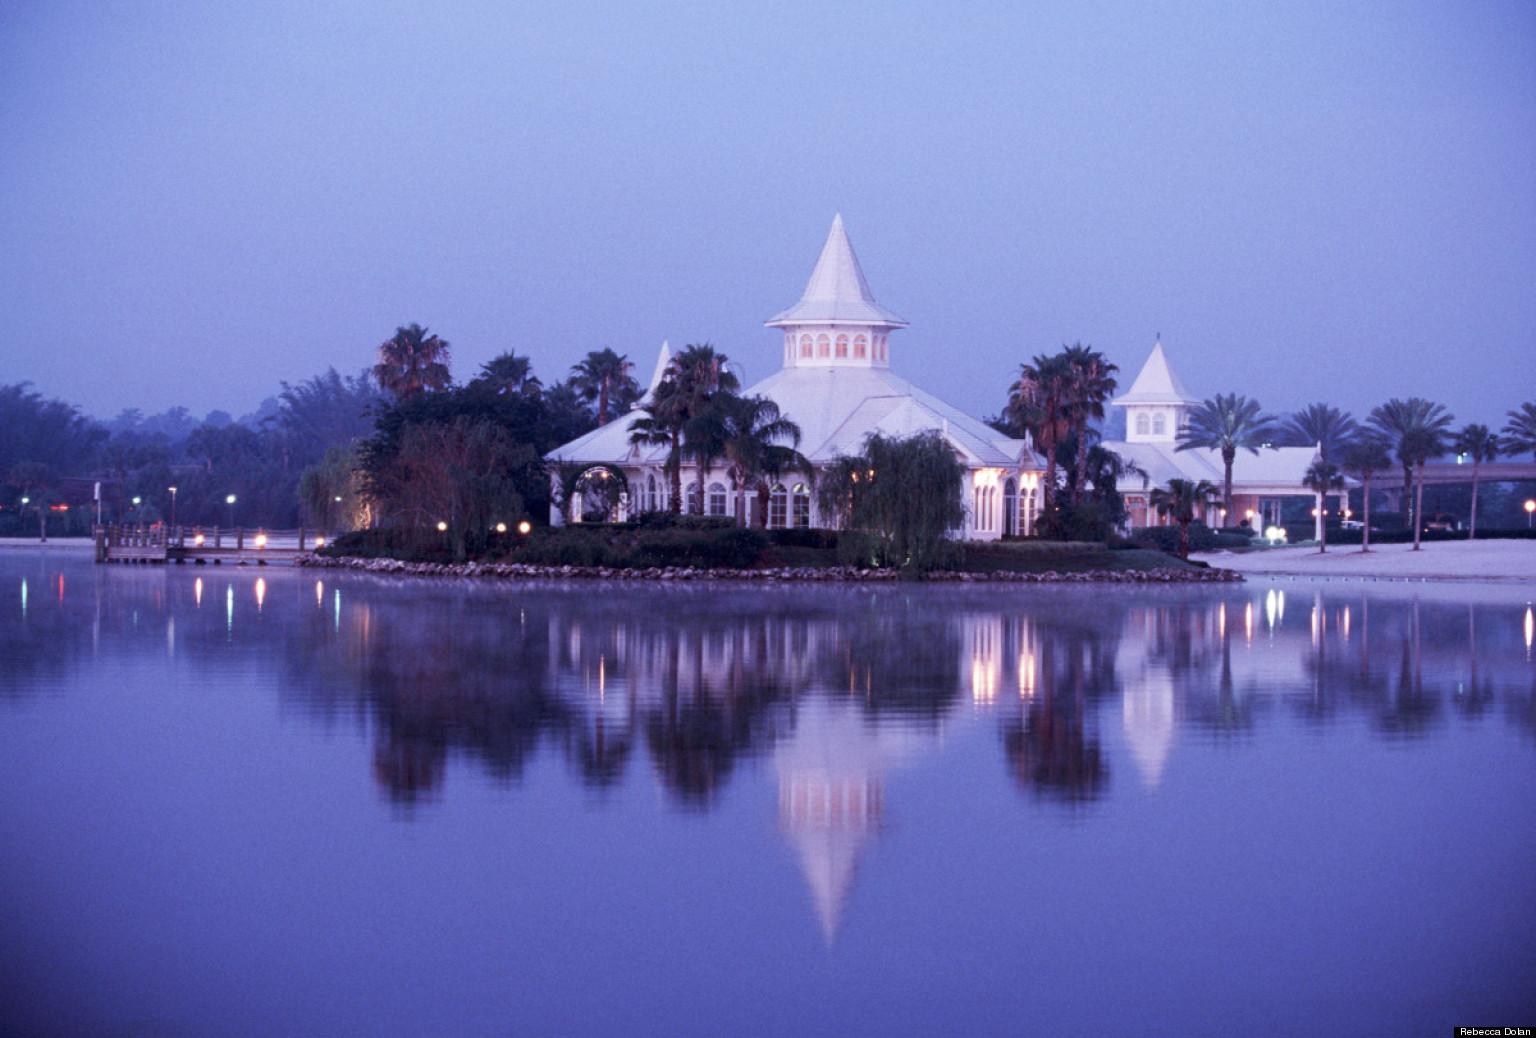 Disney World Wedding An African Night In Central Florida PHOTOS